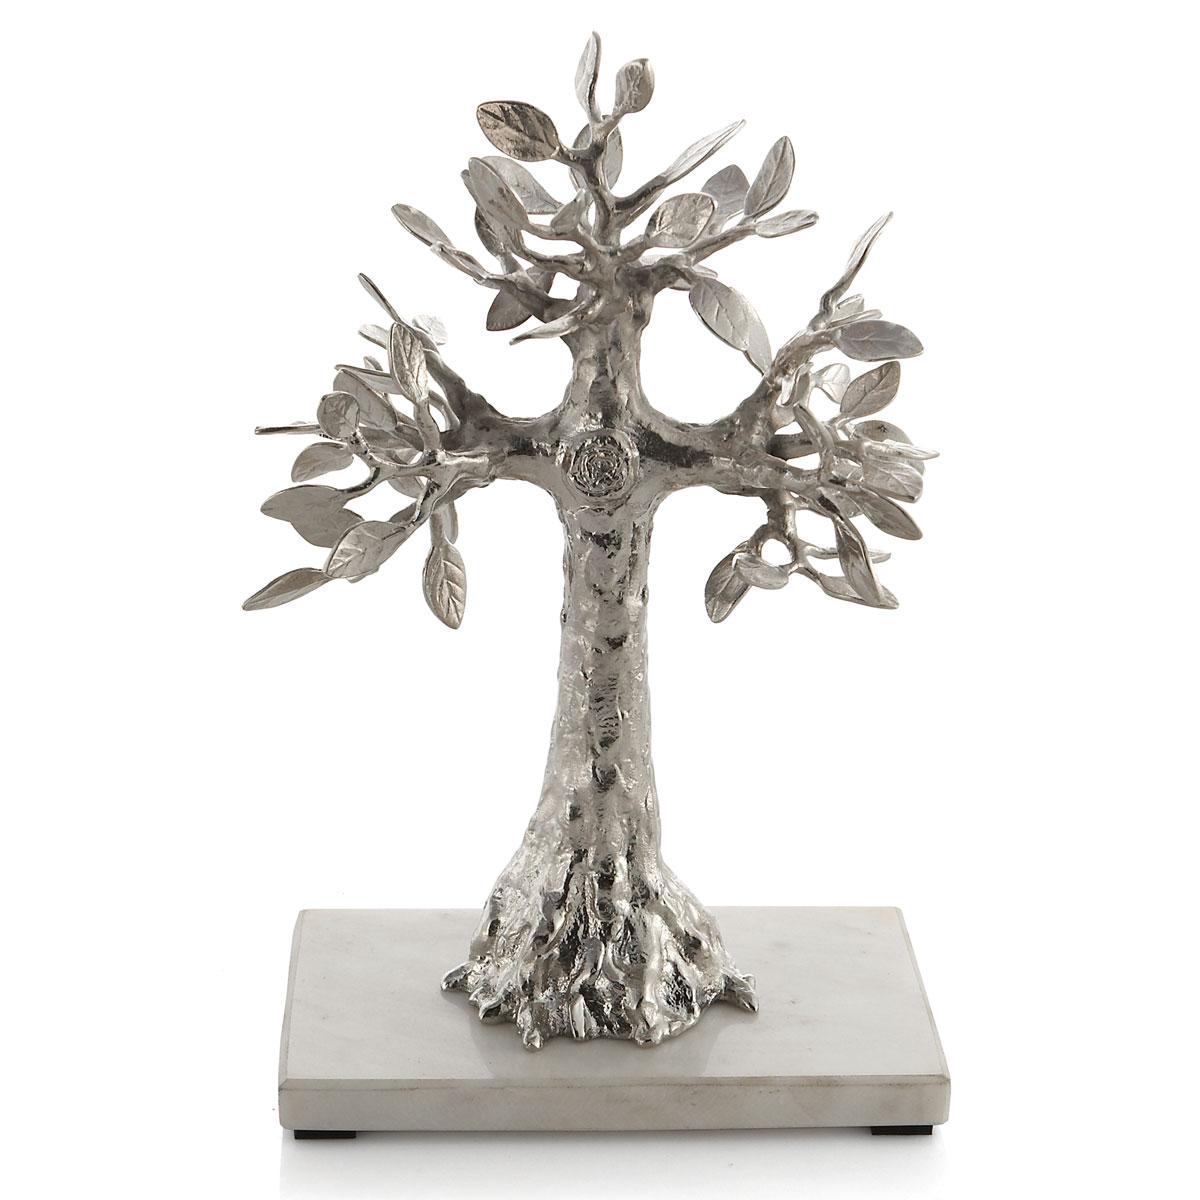 Michael Aram Foliated Cross Sculpture Nickel